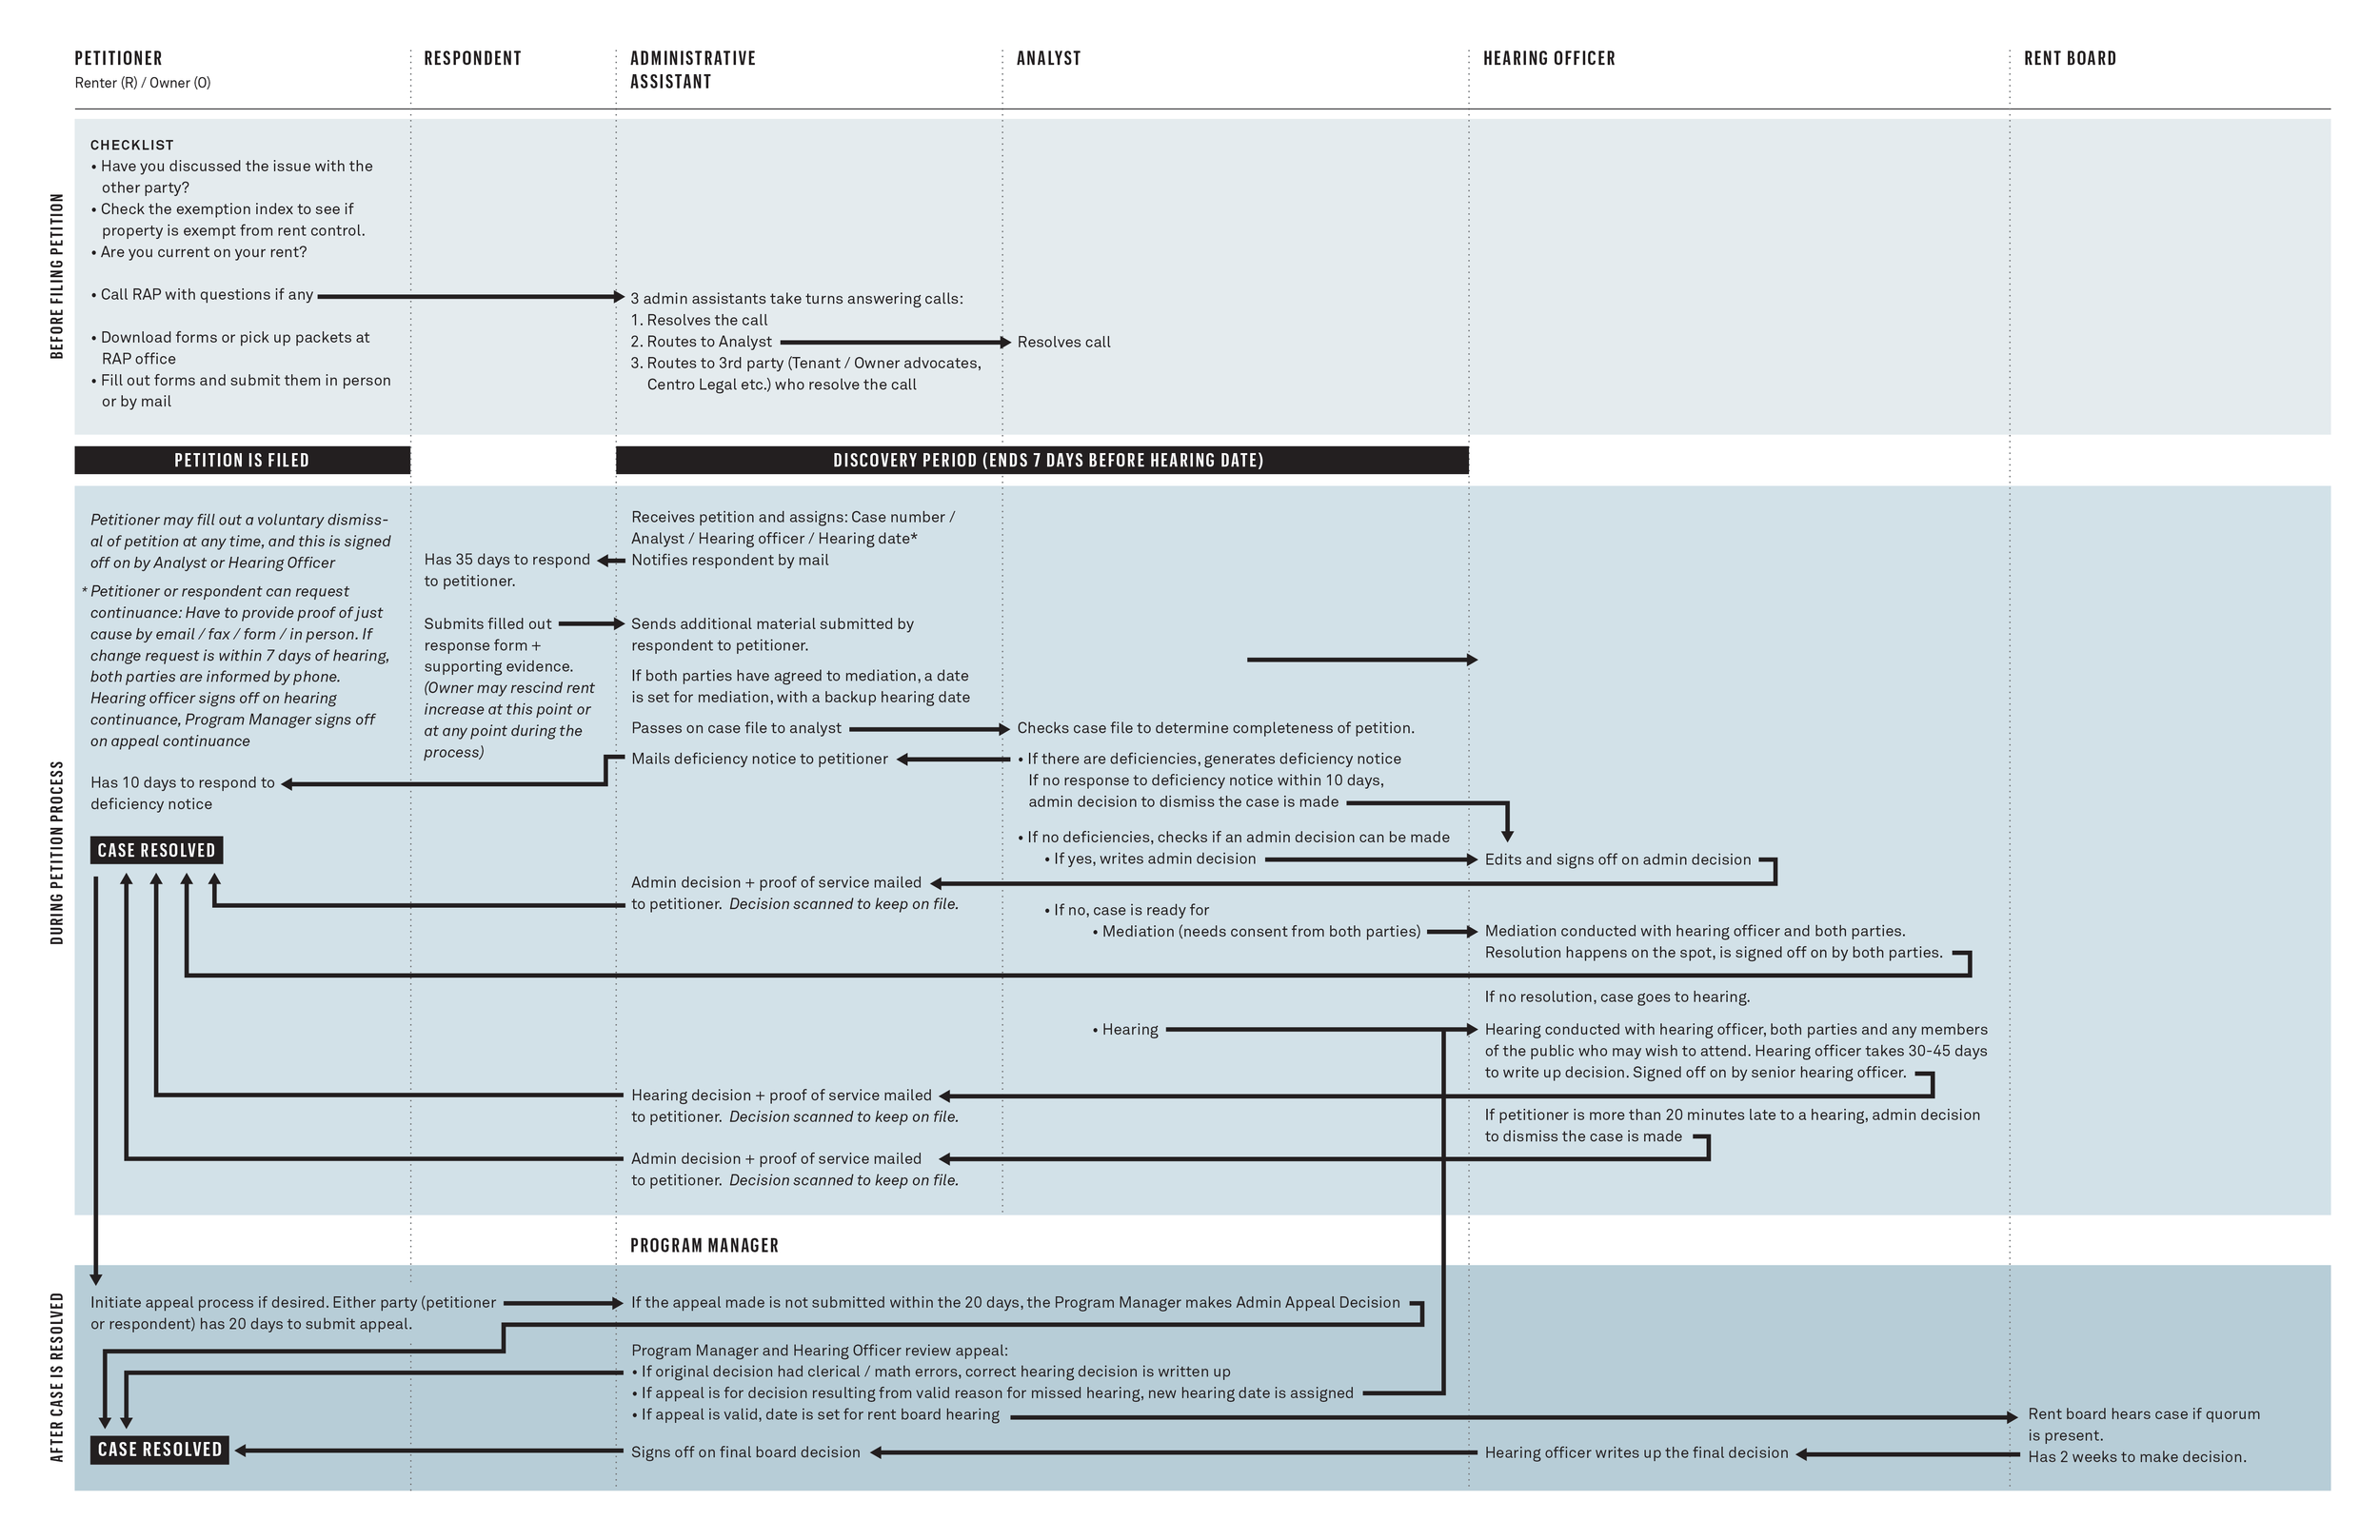 Petition workflow diagram